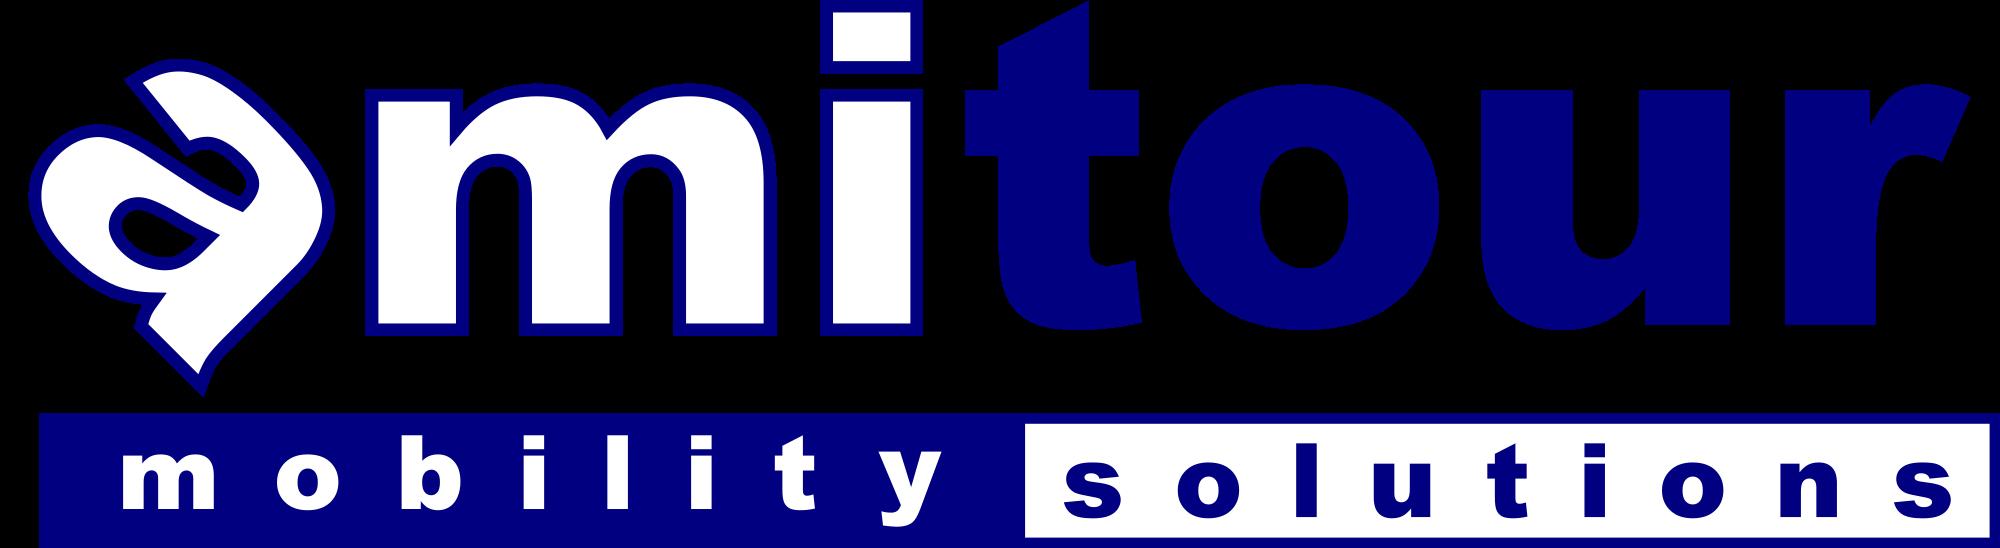 amitour.net